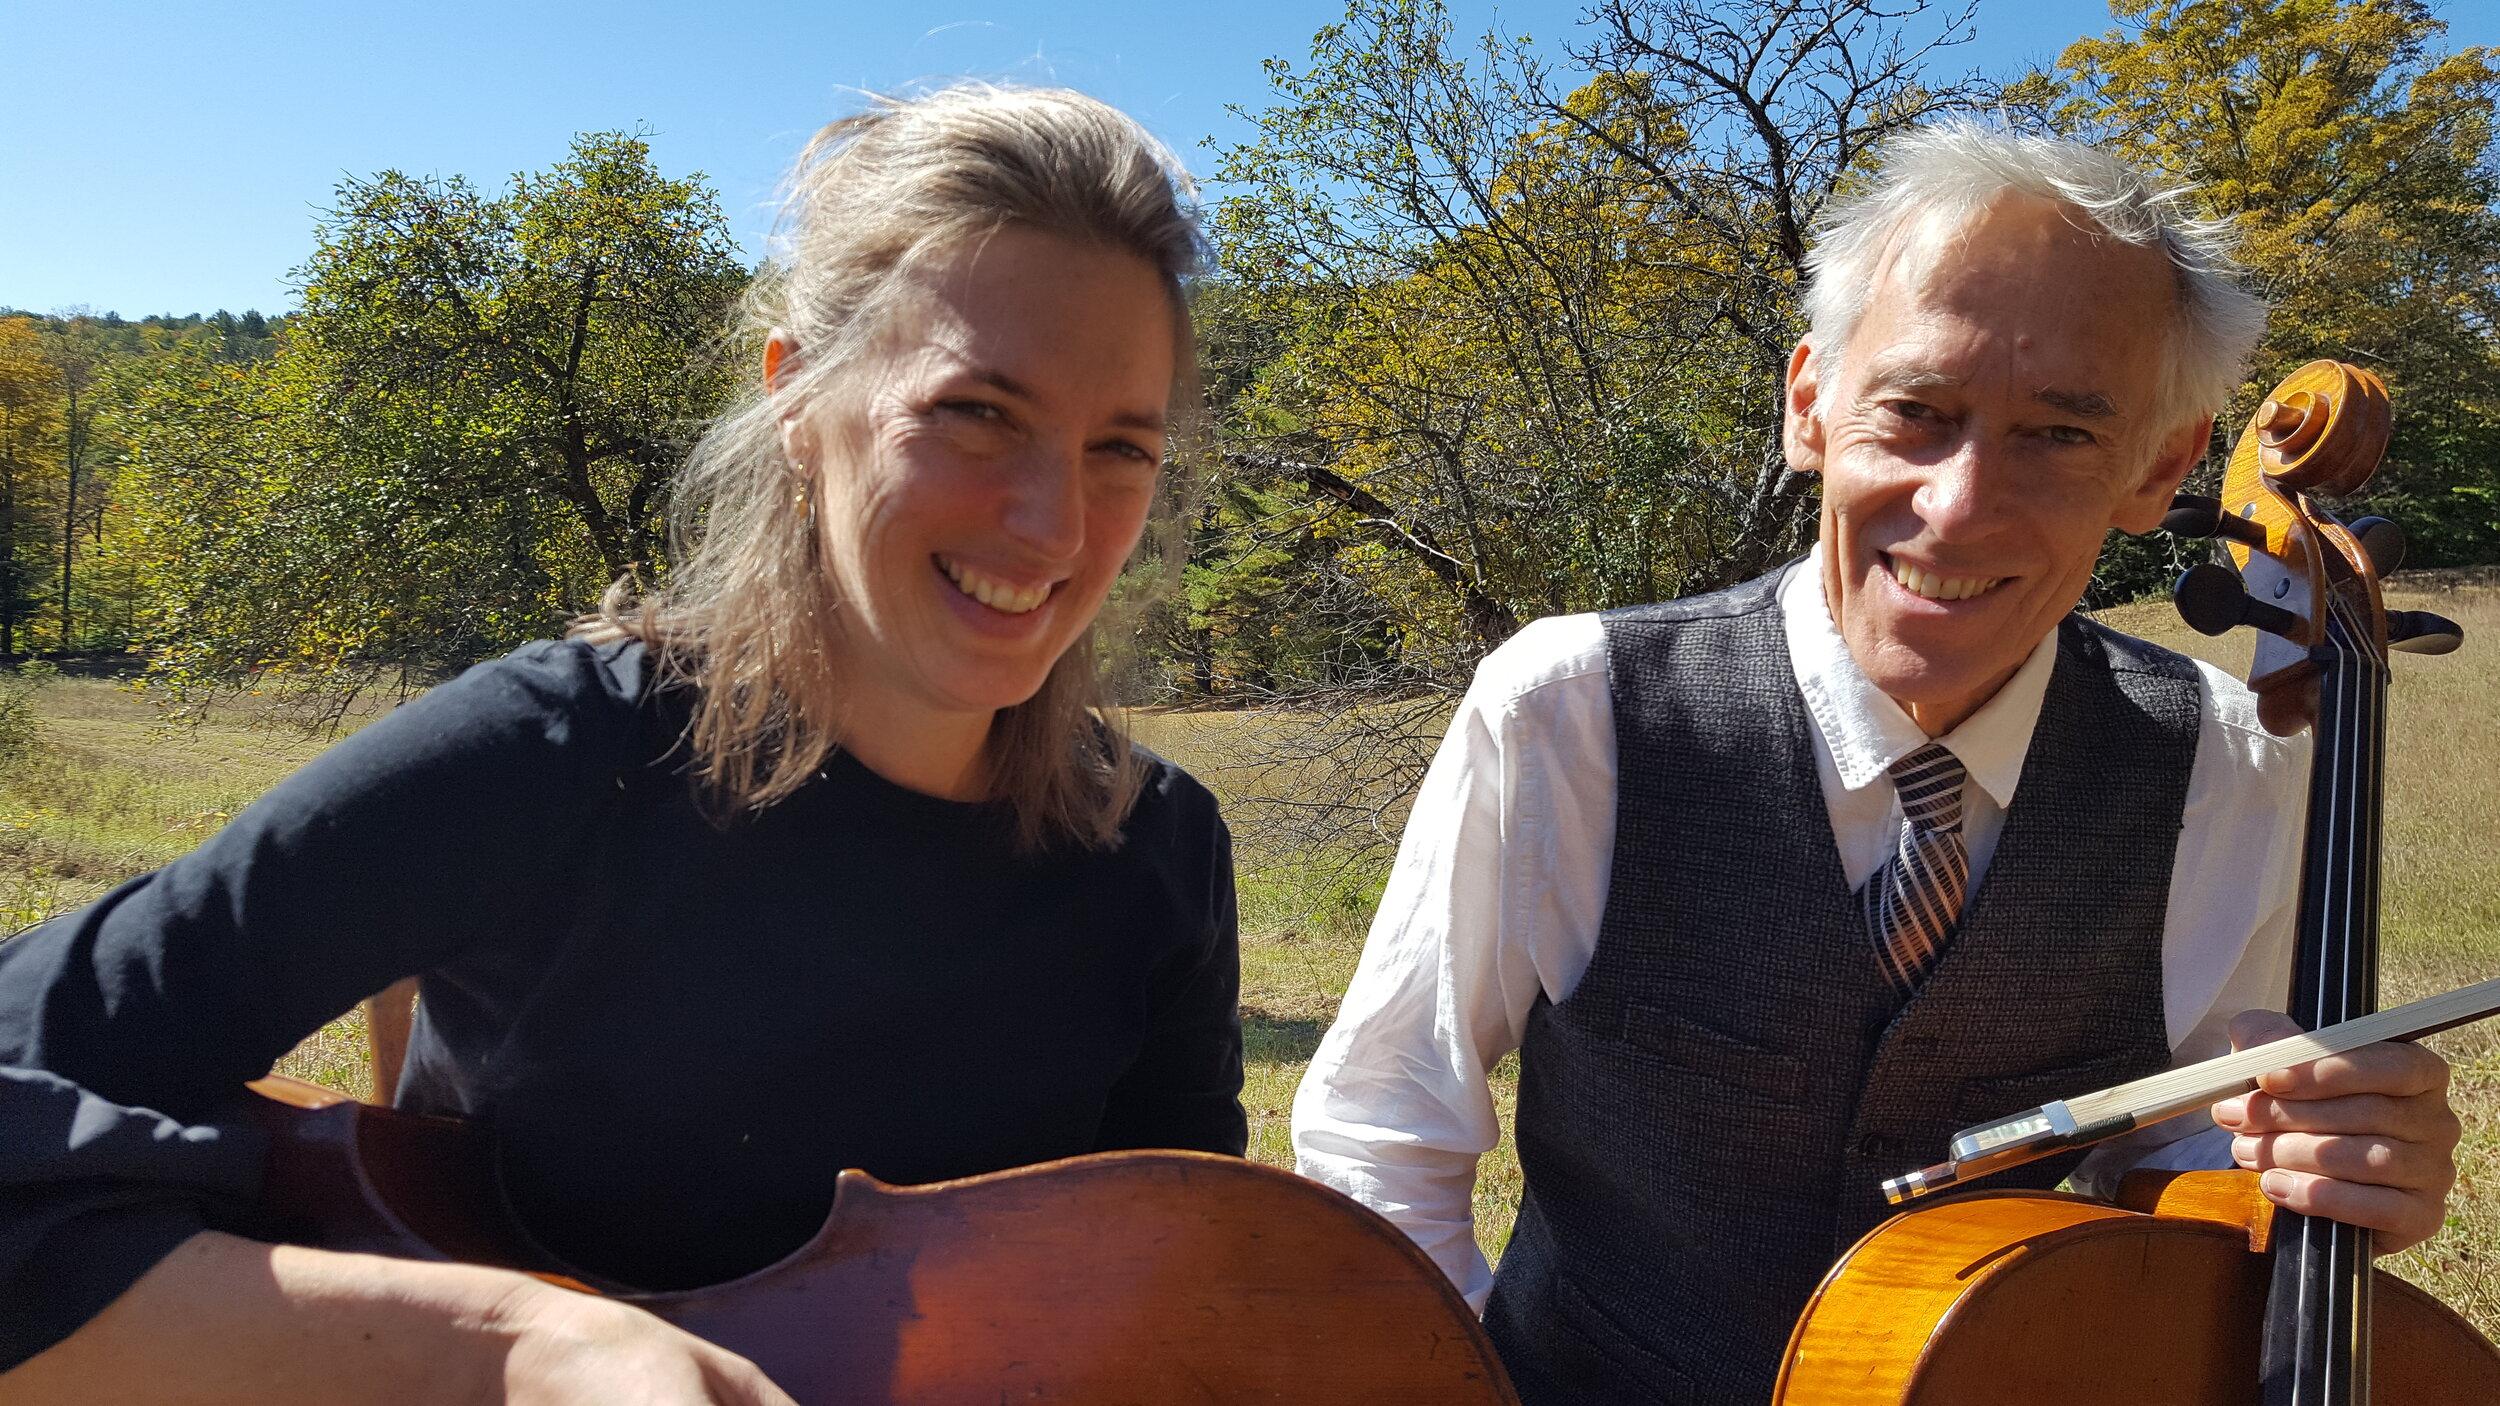 Jennifer Morsches and Tim Merton, Artistic Directors